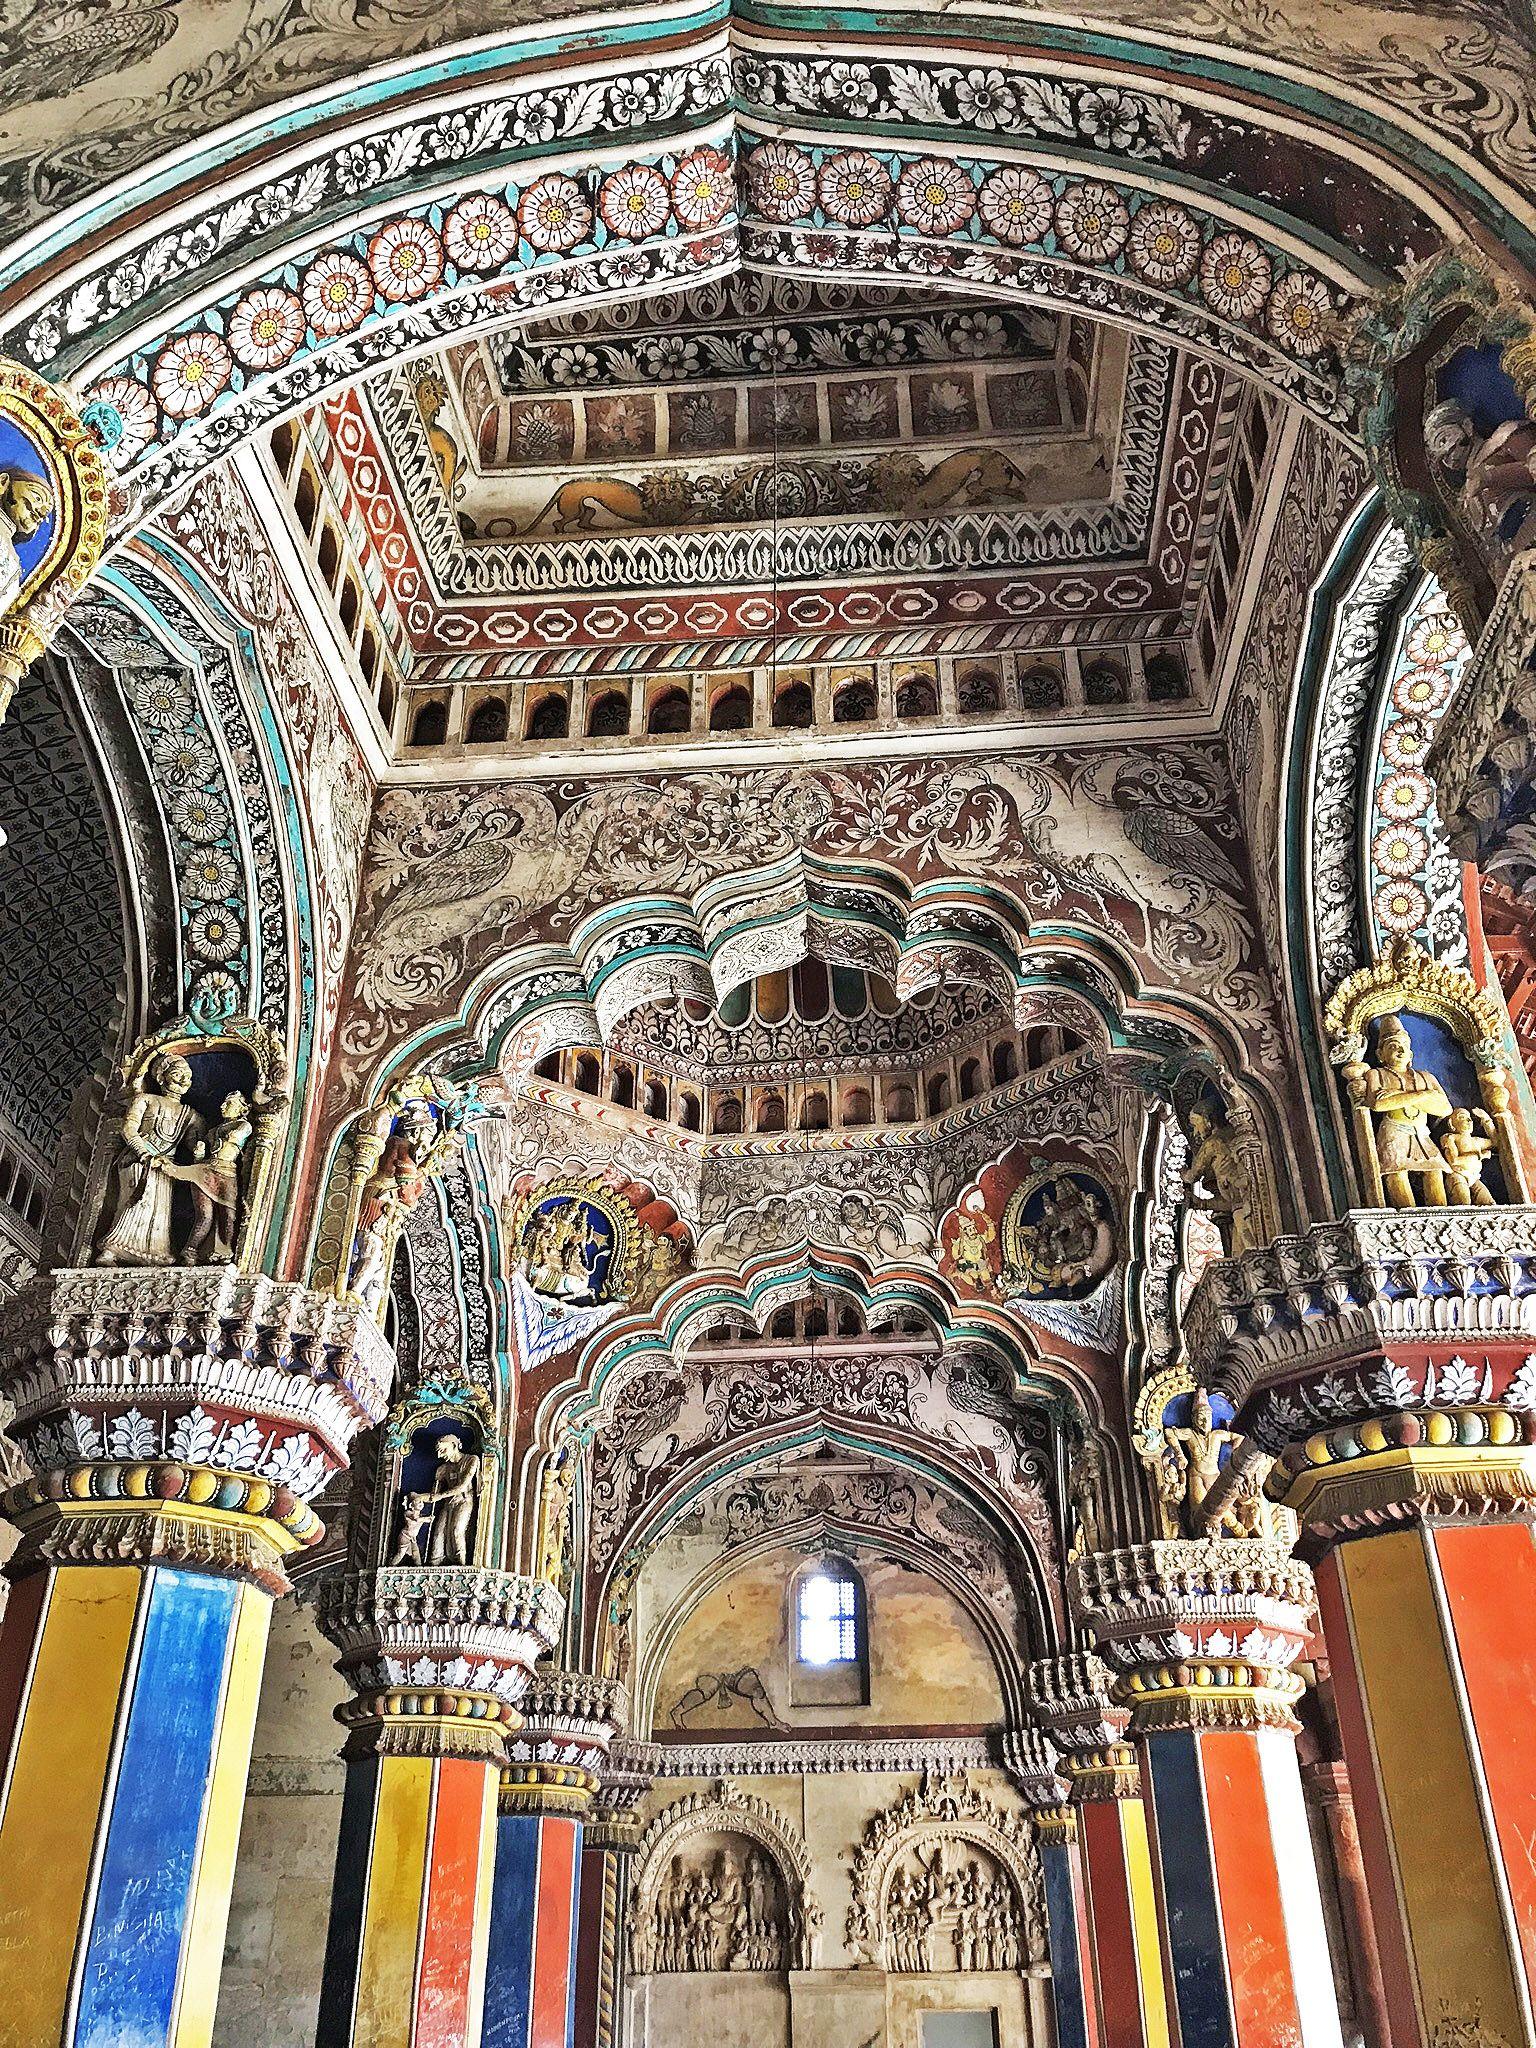 Tanjore (Thanjavur) Royal Palace interior, Tamil Nadu